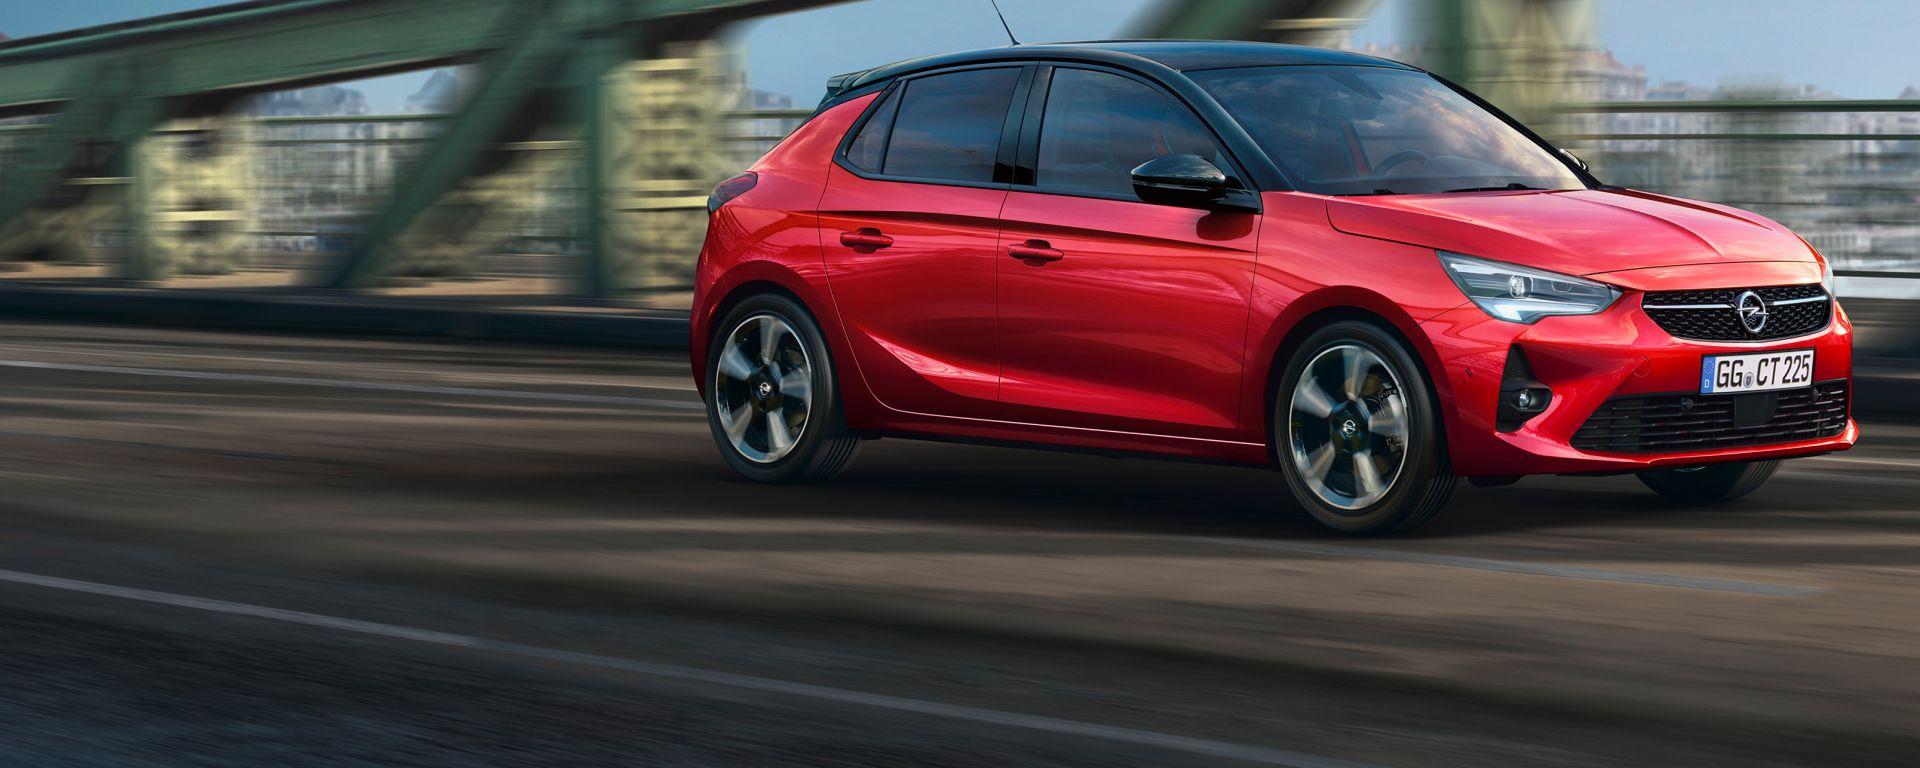 Opel Corsa Ultimate 2021